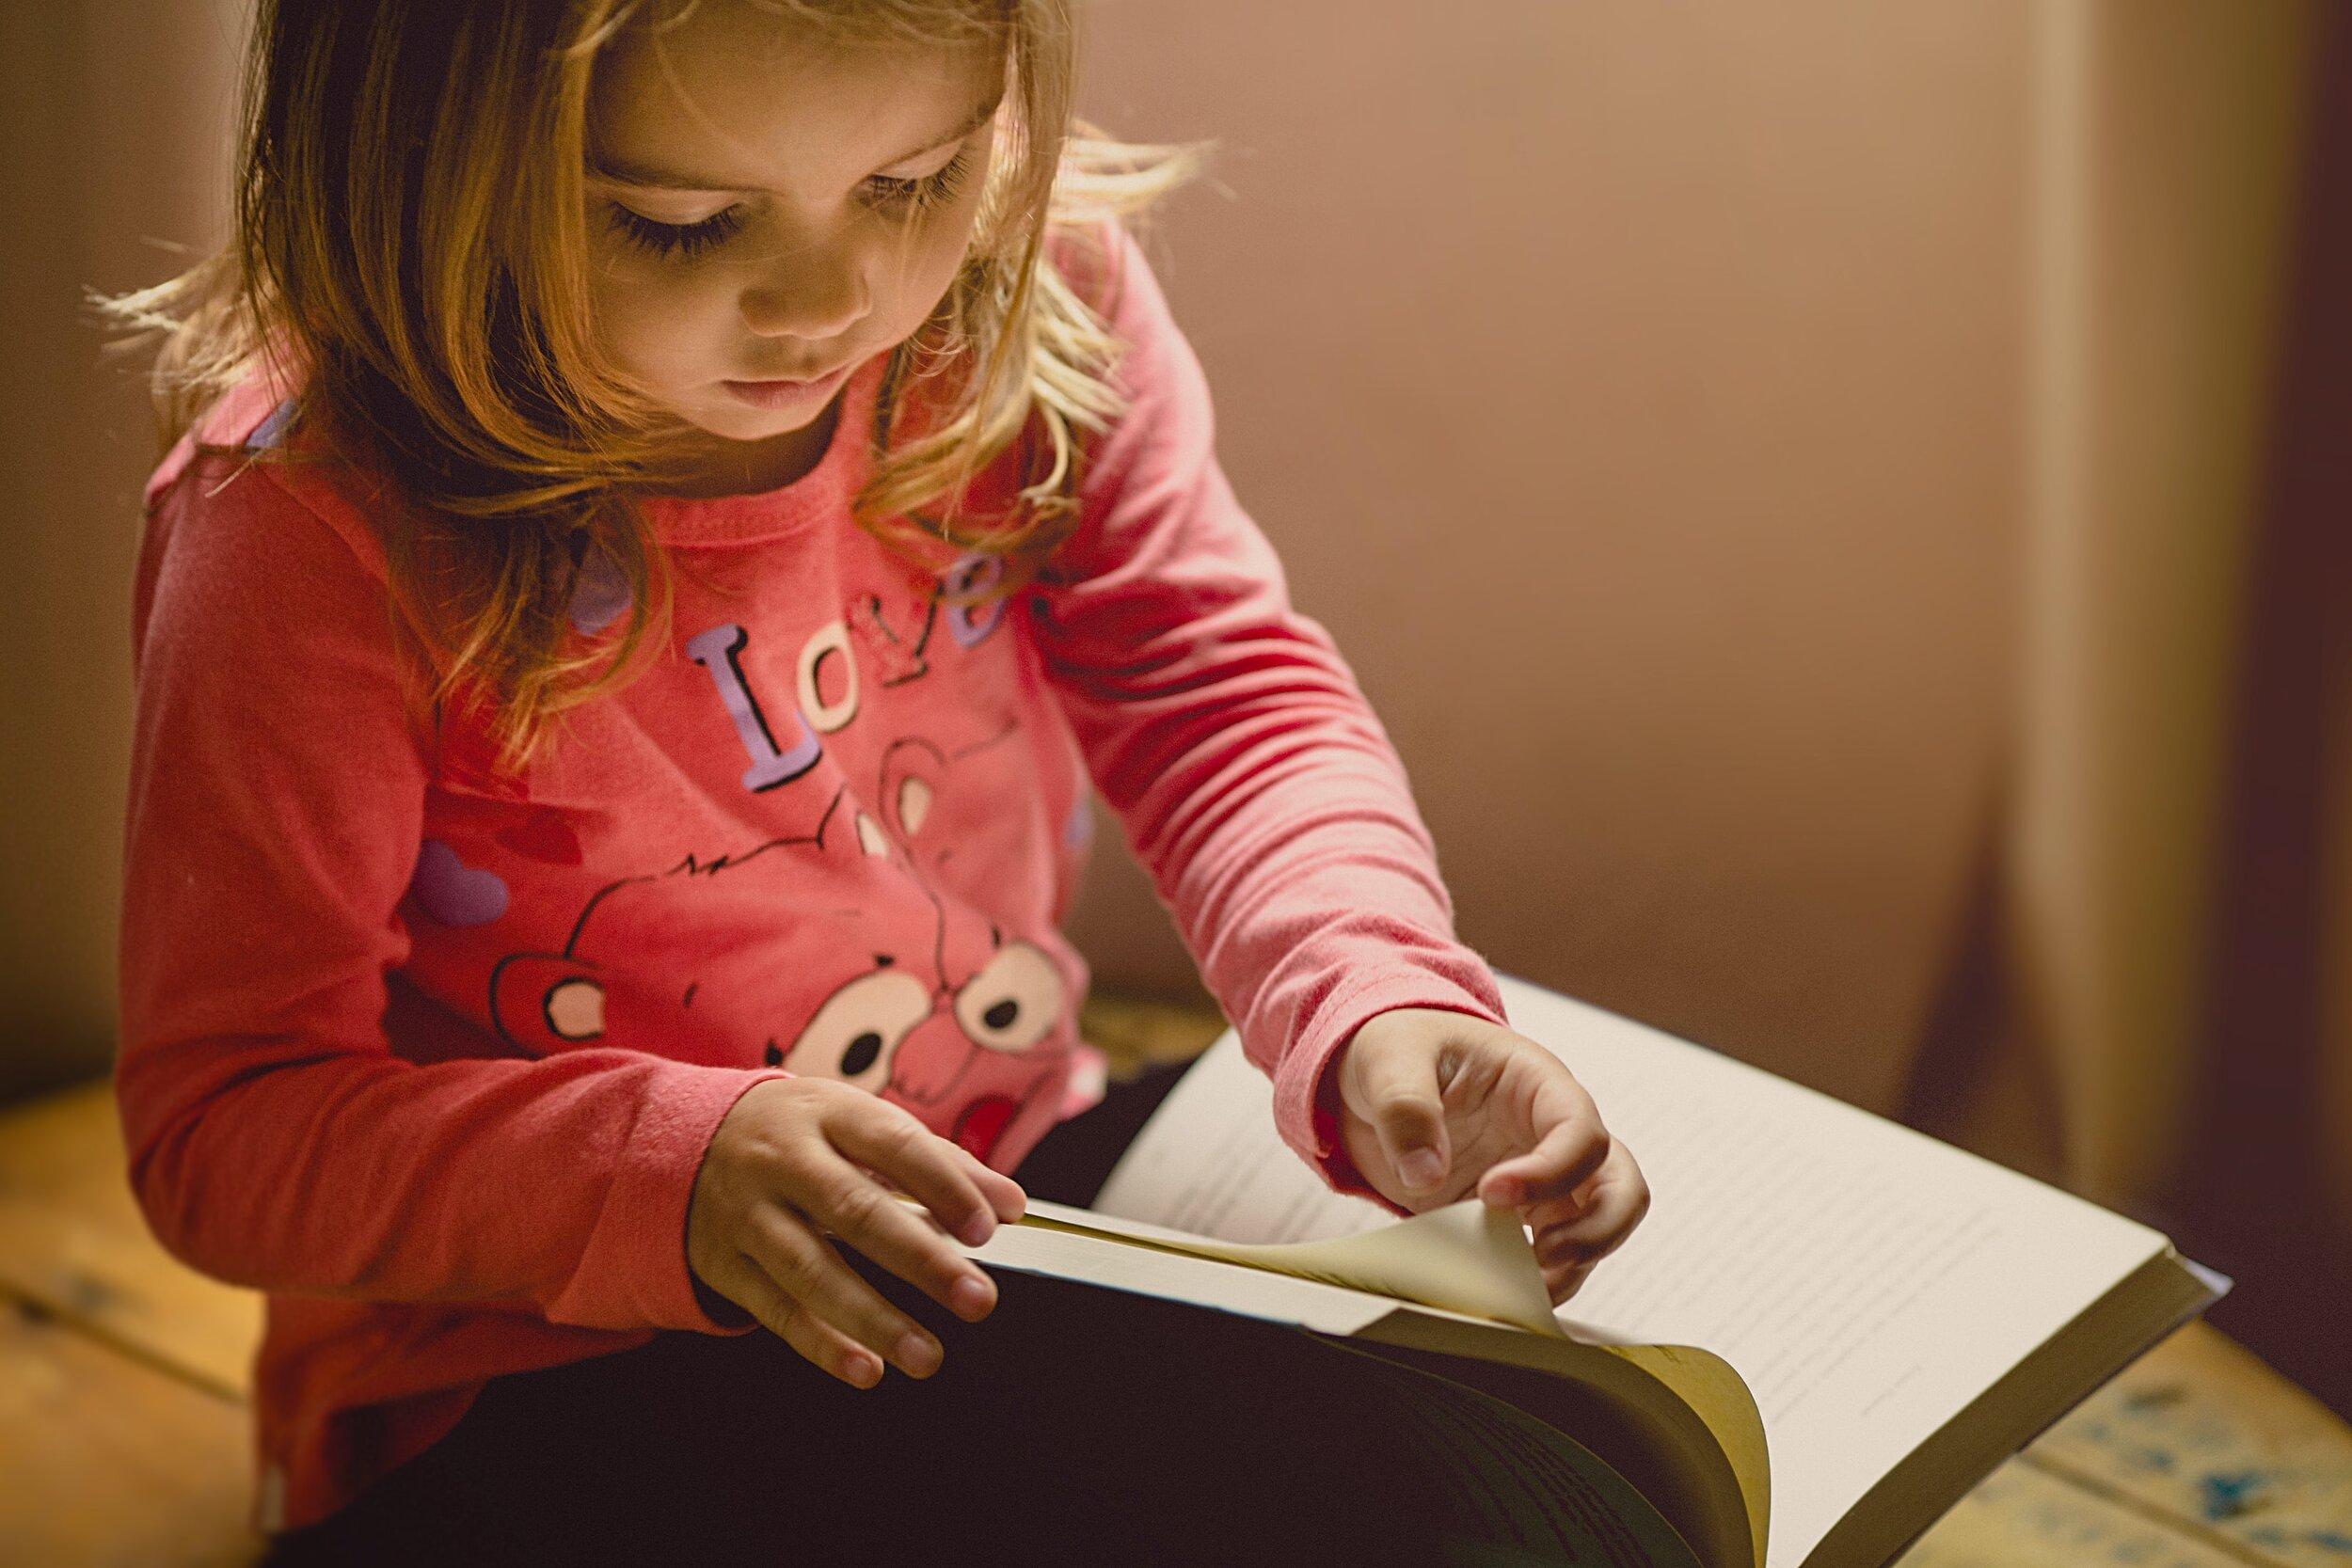 Tonsillitis in children